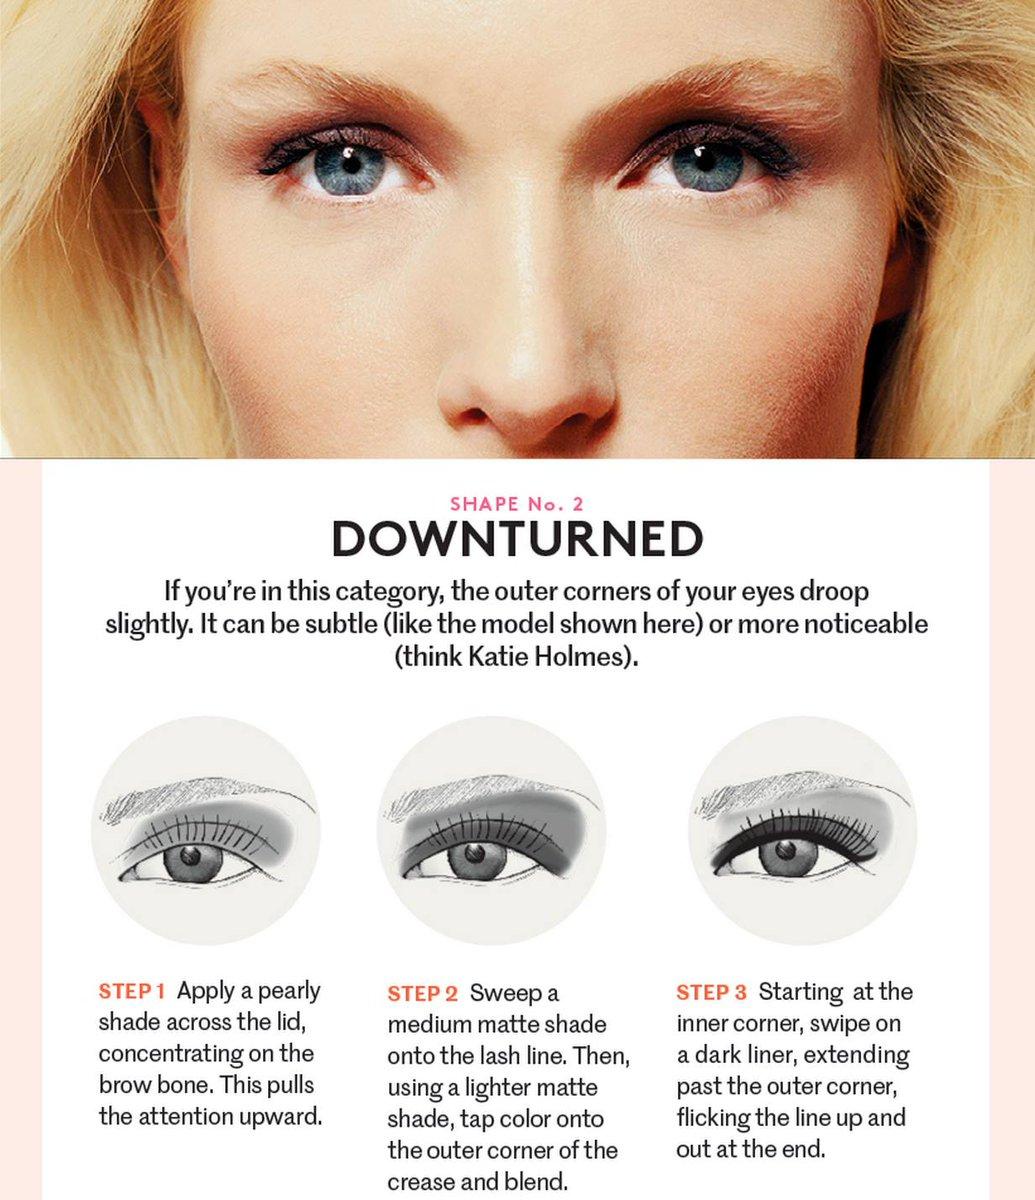 Best eye makeup for hooded eyes